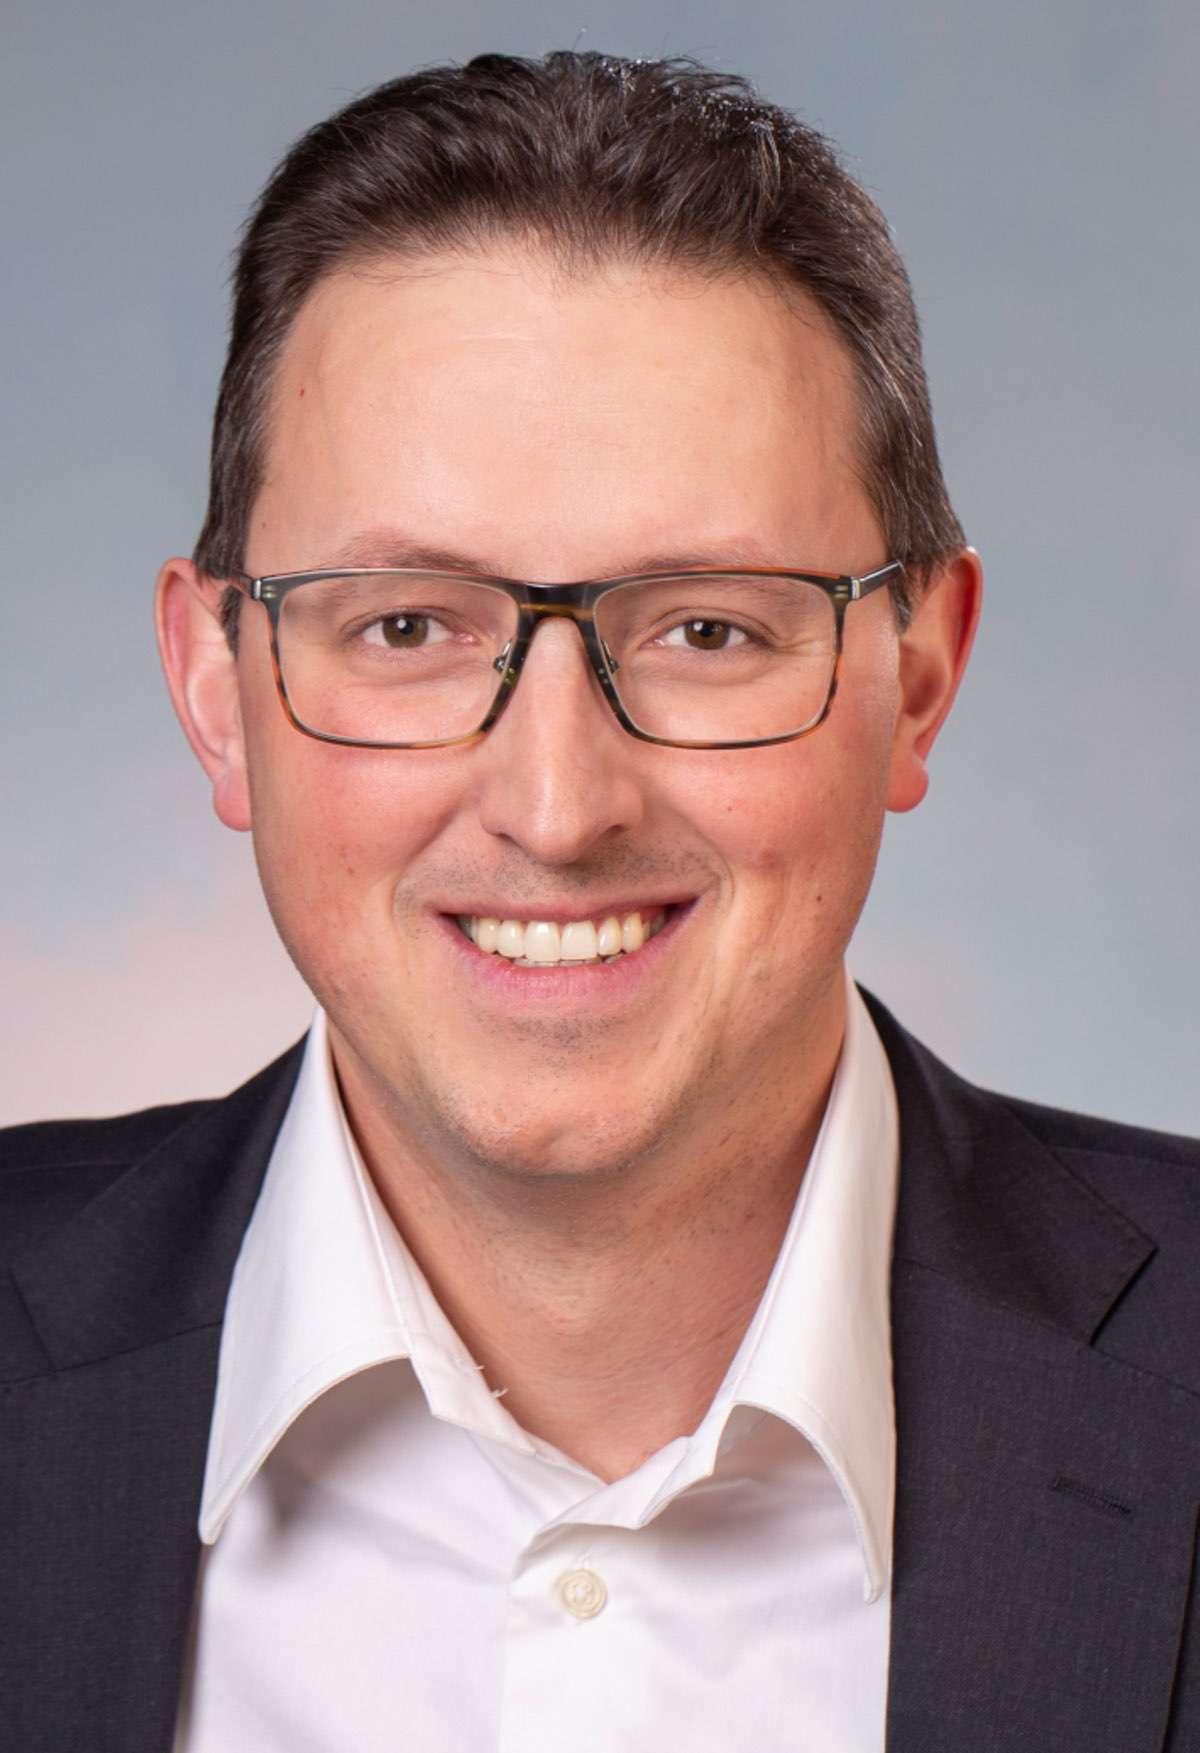 Seabix Thierry Kramis CEO